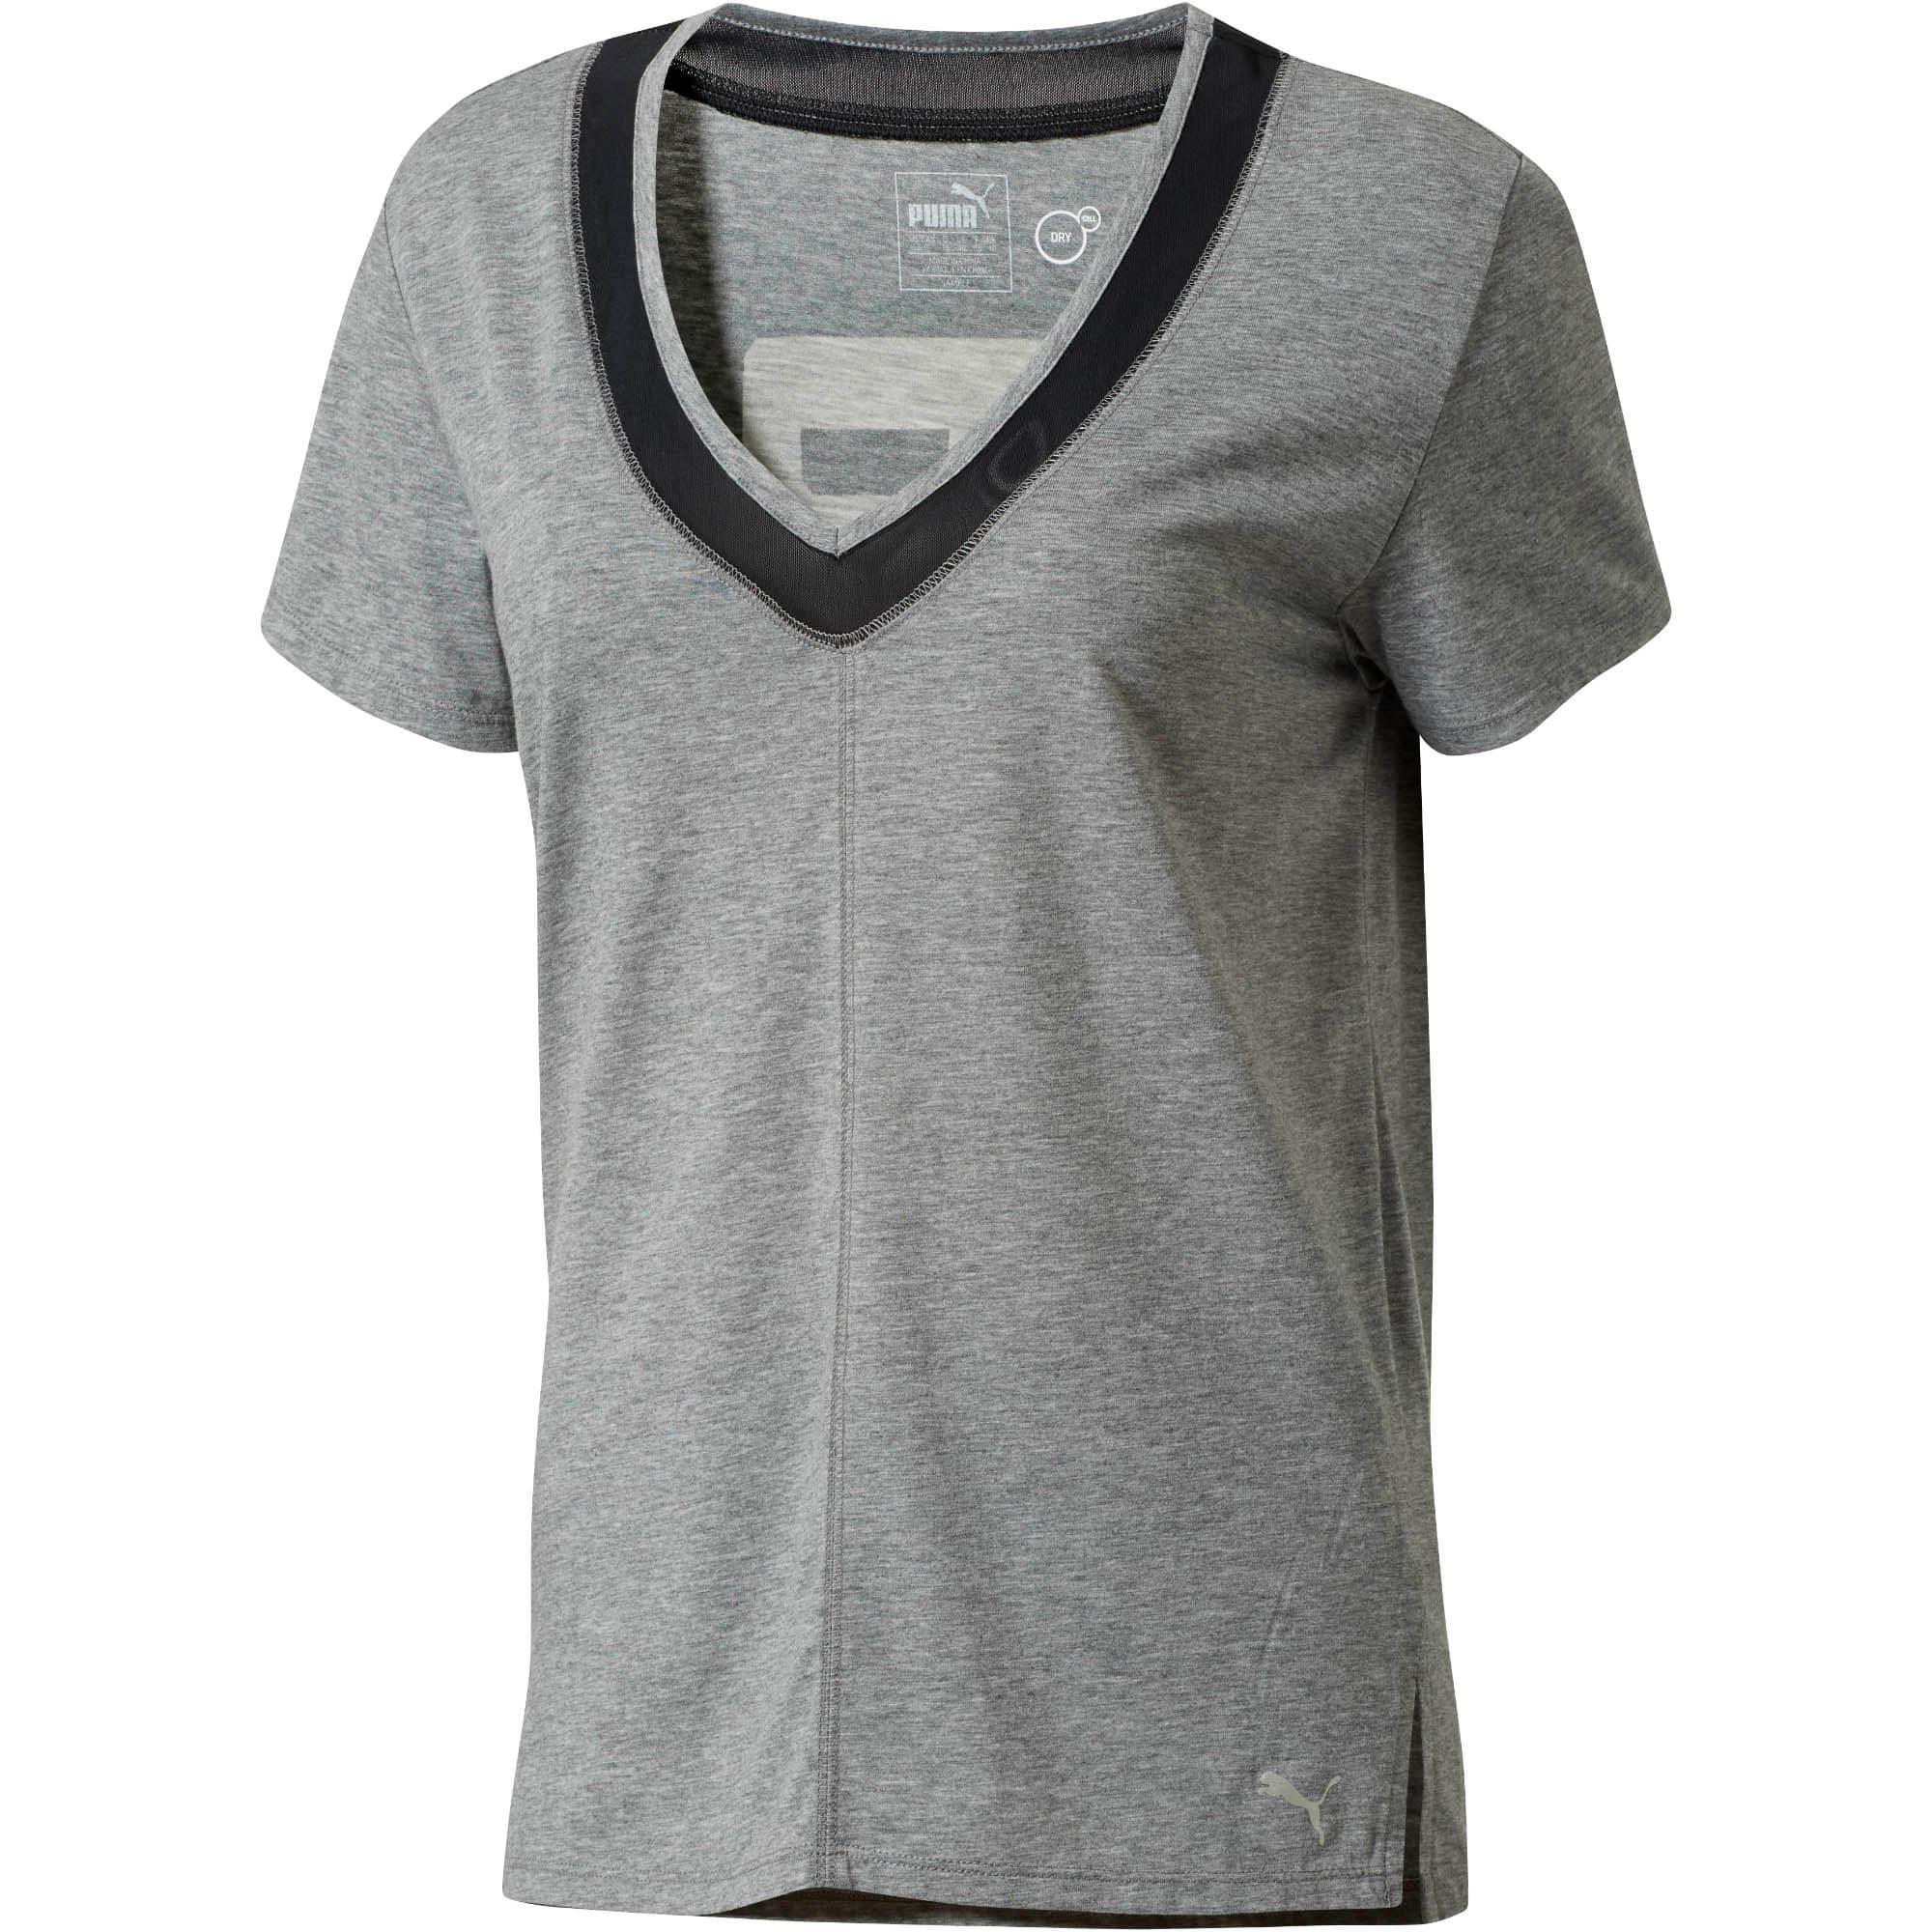 Thumbnail 1 of Slouchy-V Mesh T-Shirt, MGH-Puma Black, medium